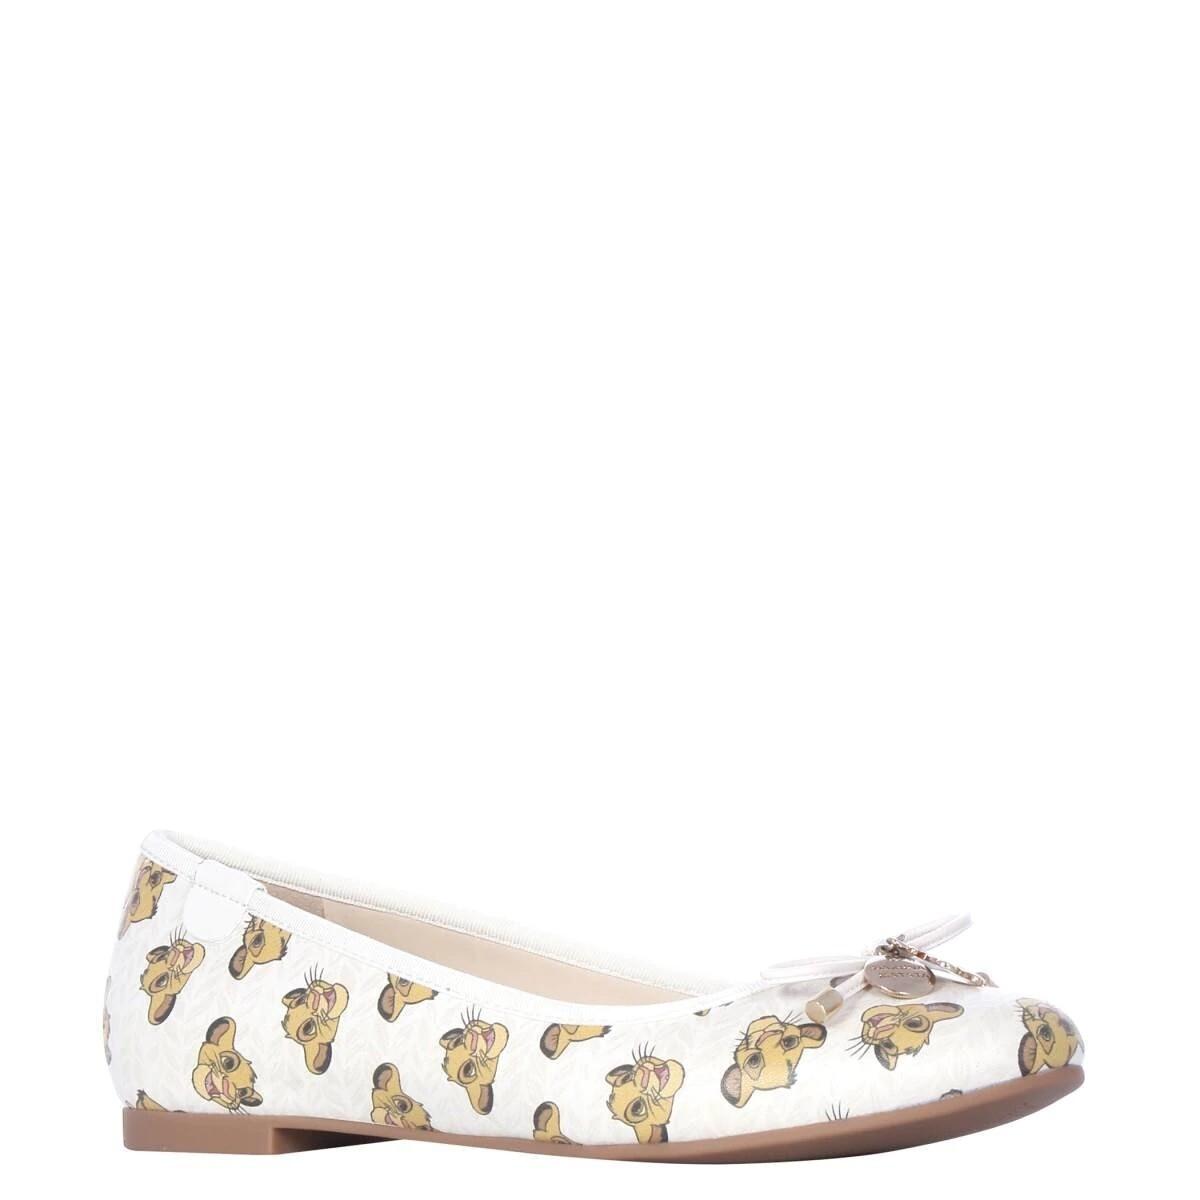 Zapatos Rey Leon BL08